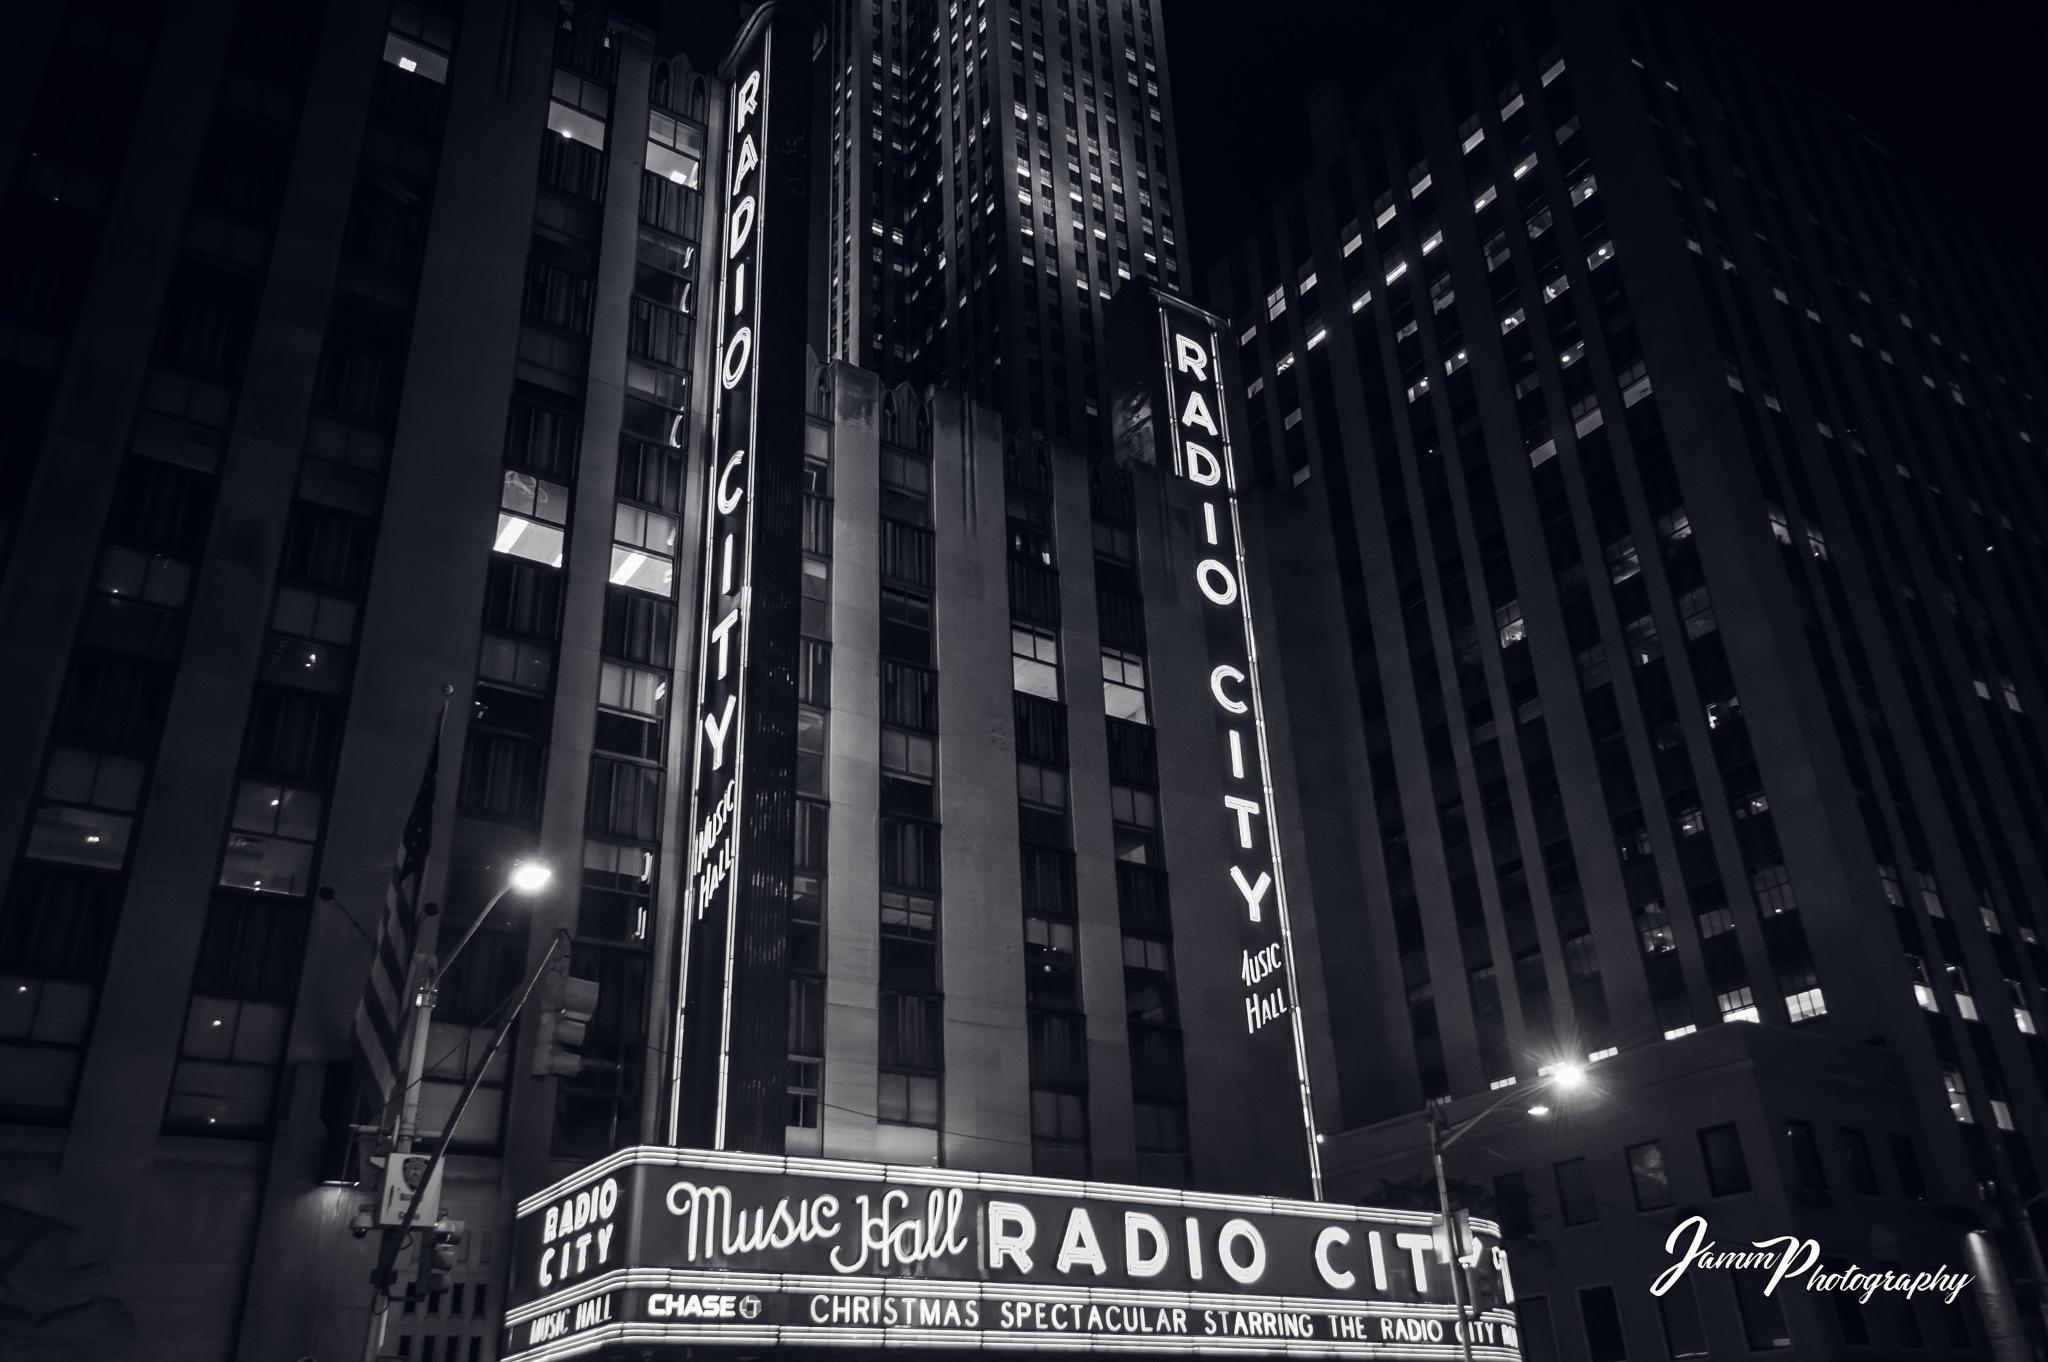 Neon Radio by TitoPhotographyInc